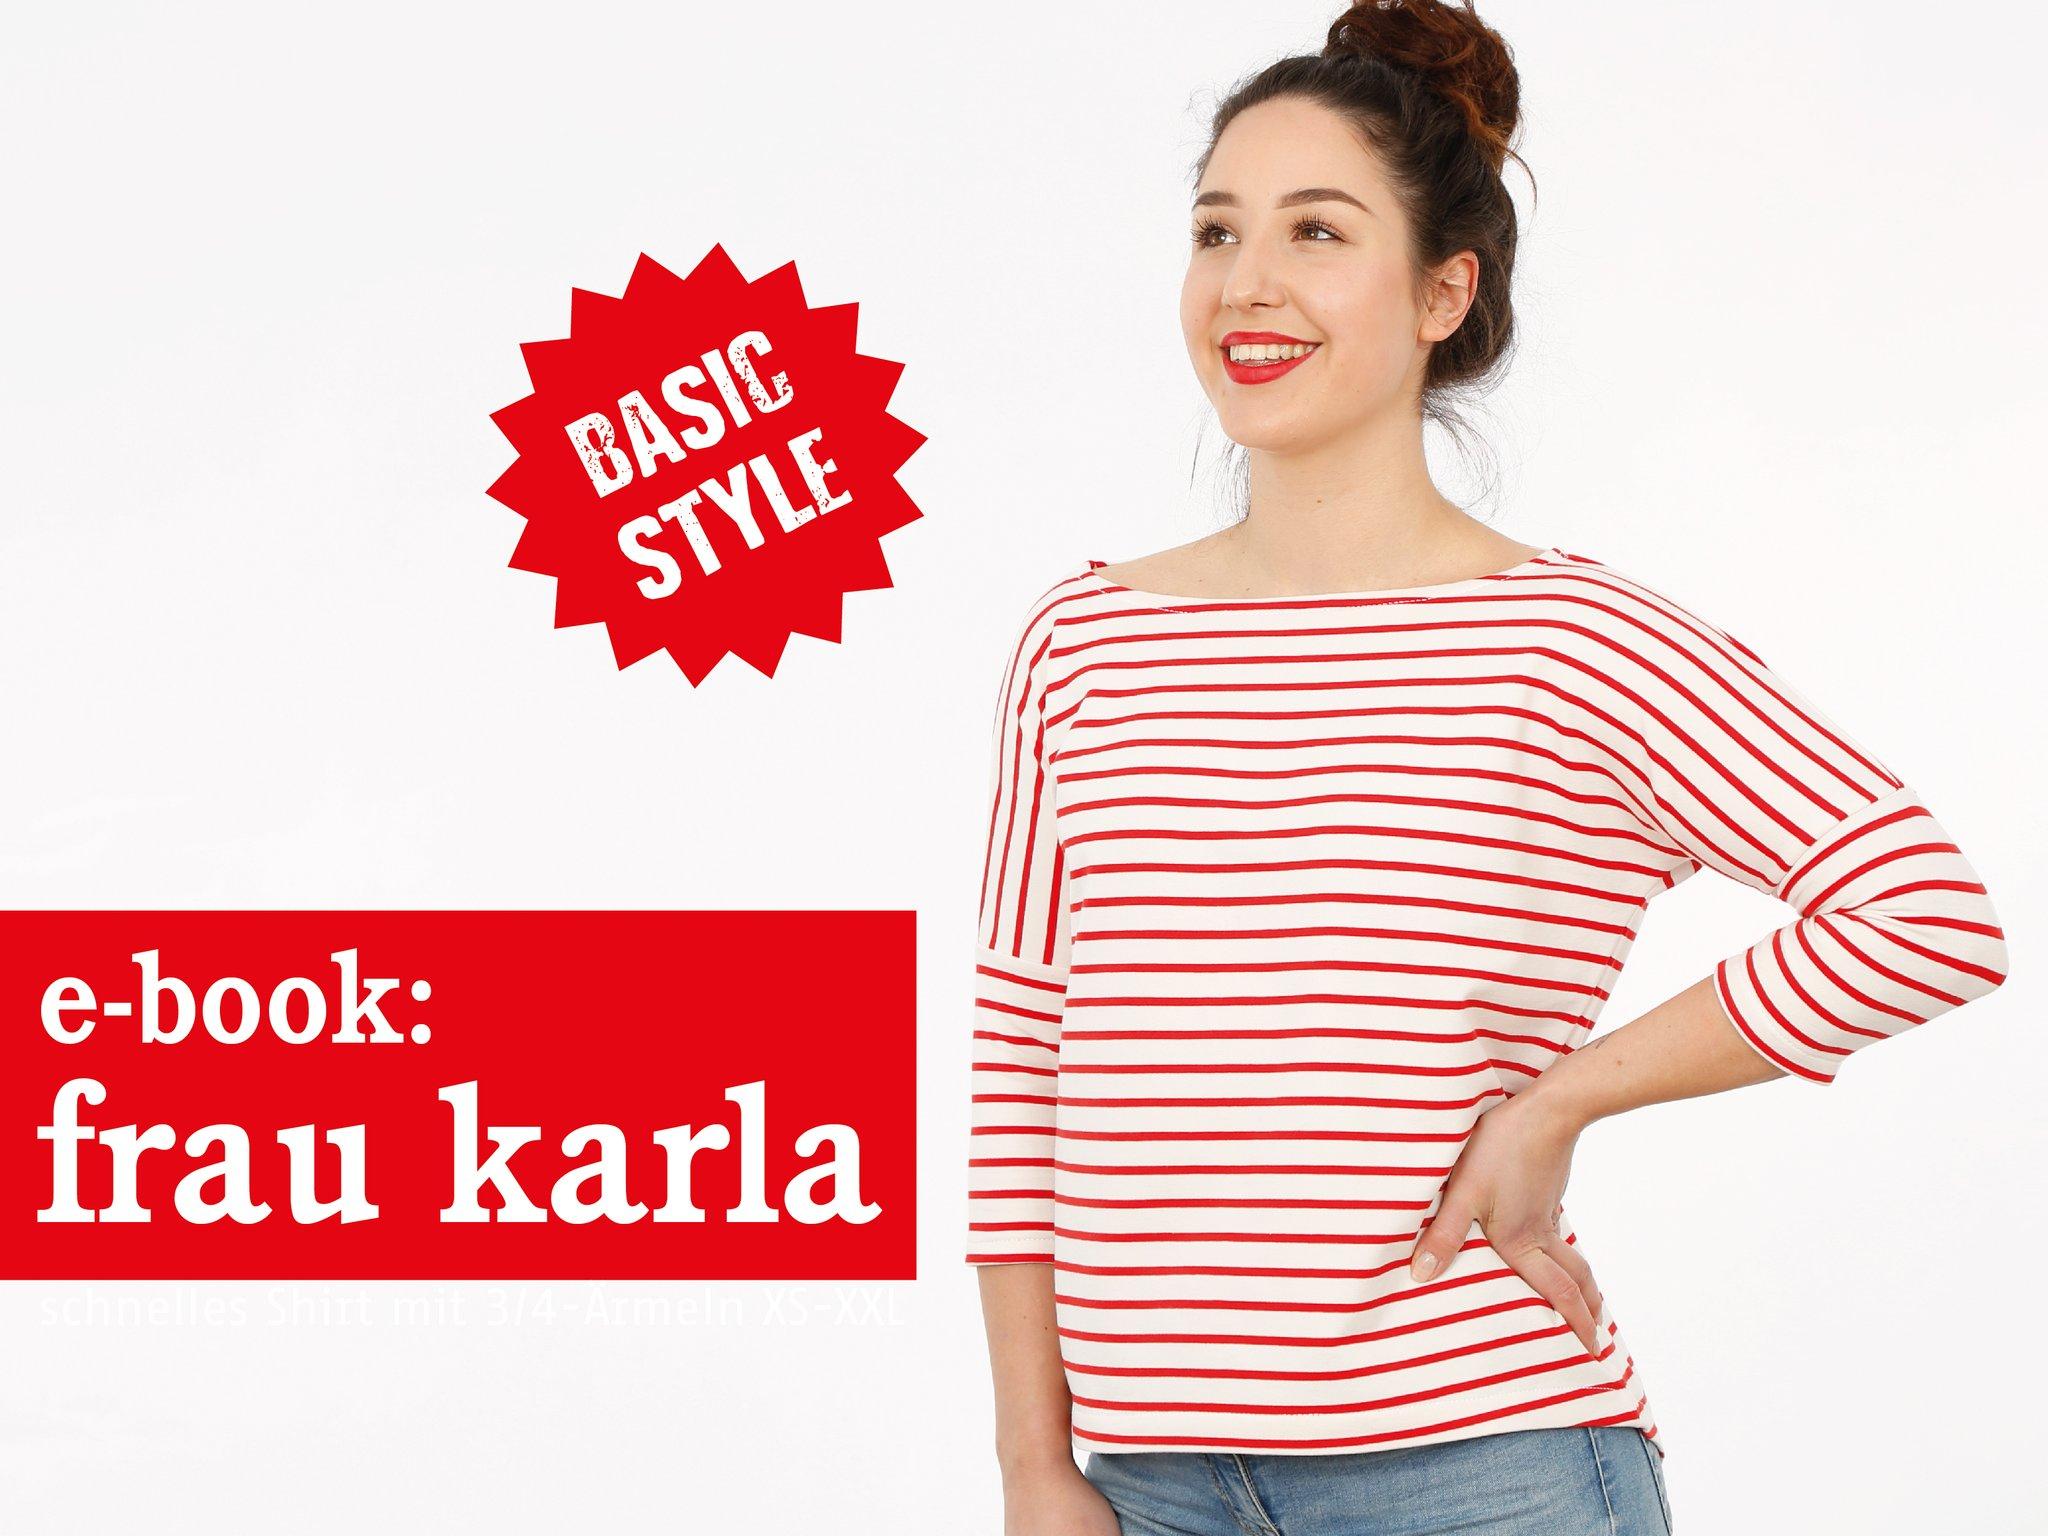 FRAU KARLA • Sommershirt 3/4-Ärmel, e-book